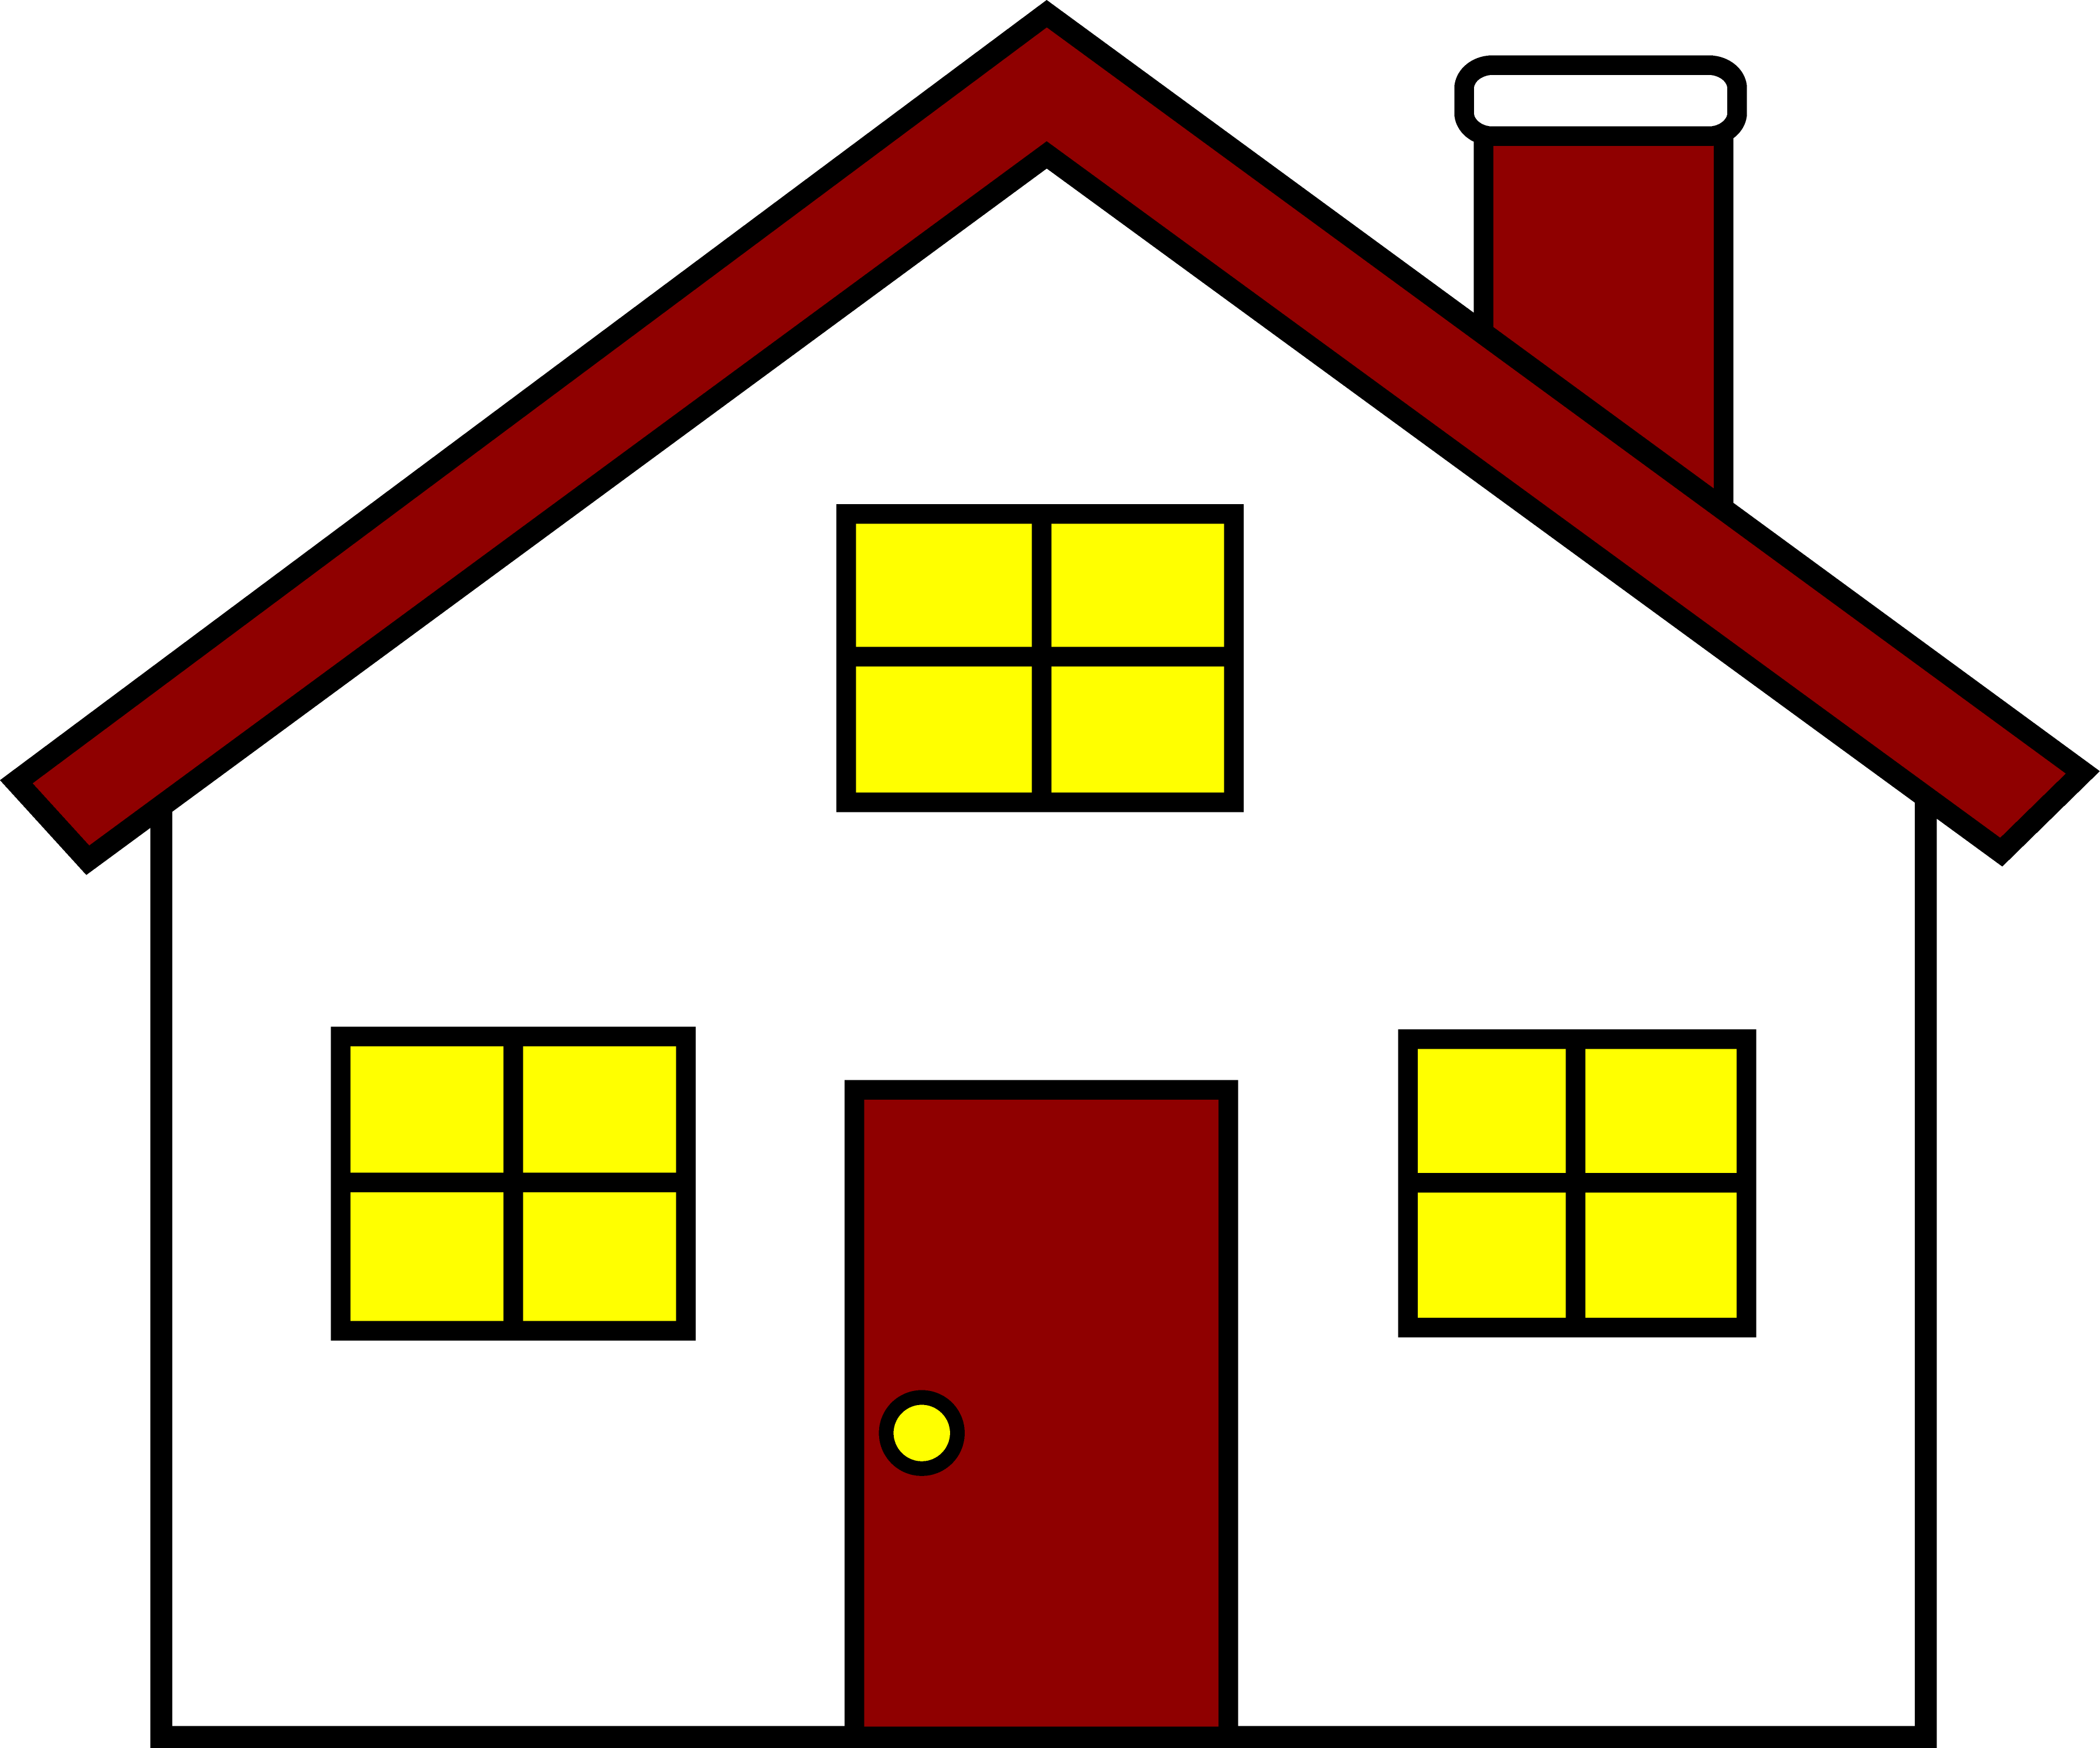 clipart house-clipart house-14